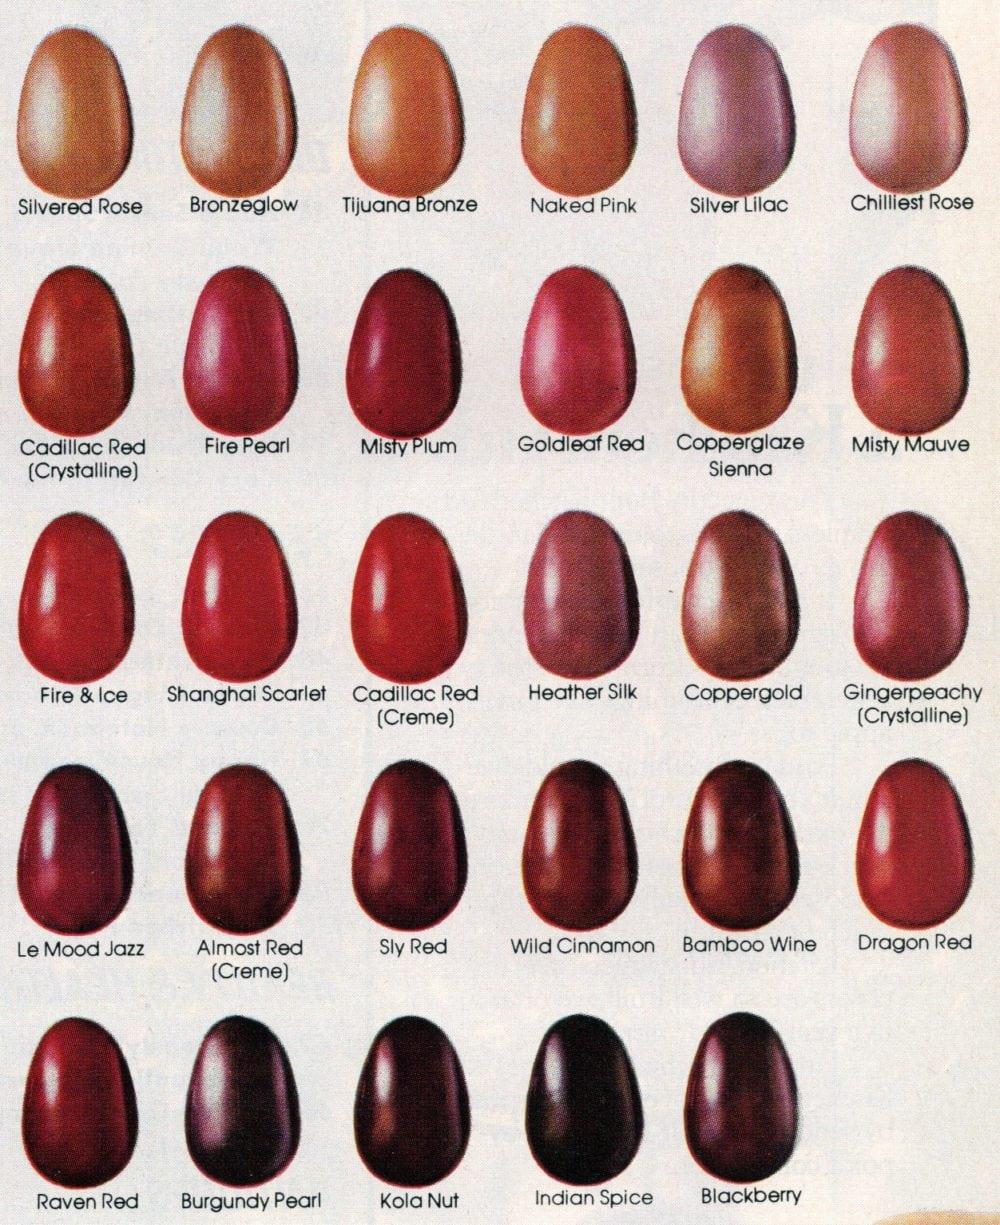 109 colors of retro Revlon nailpolish from the '80s